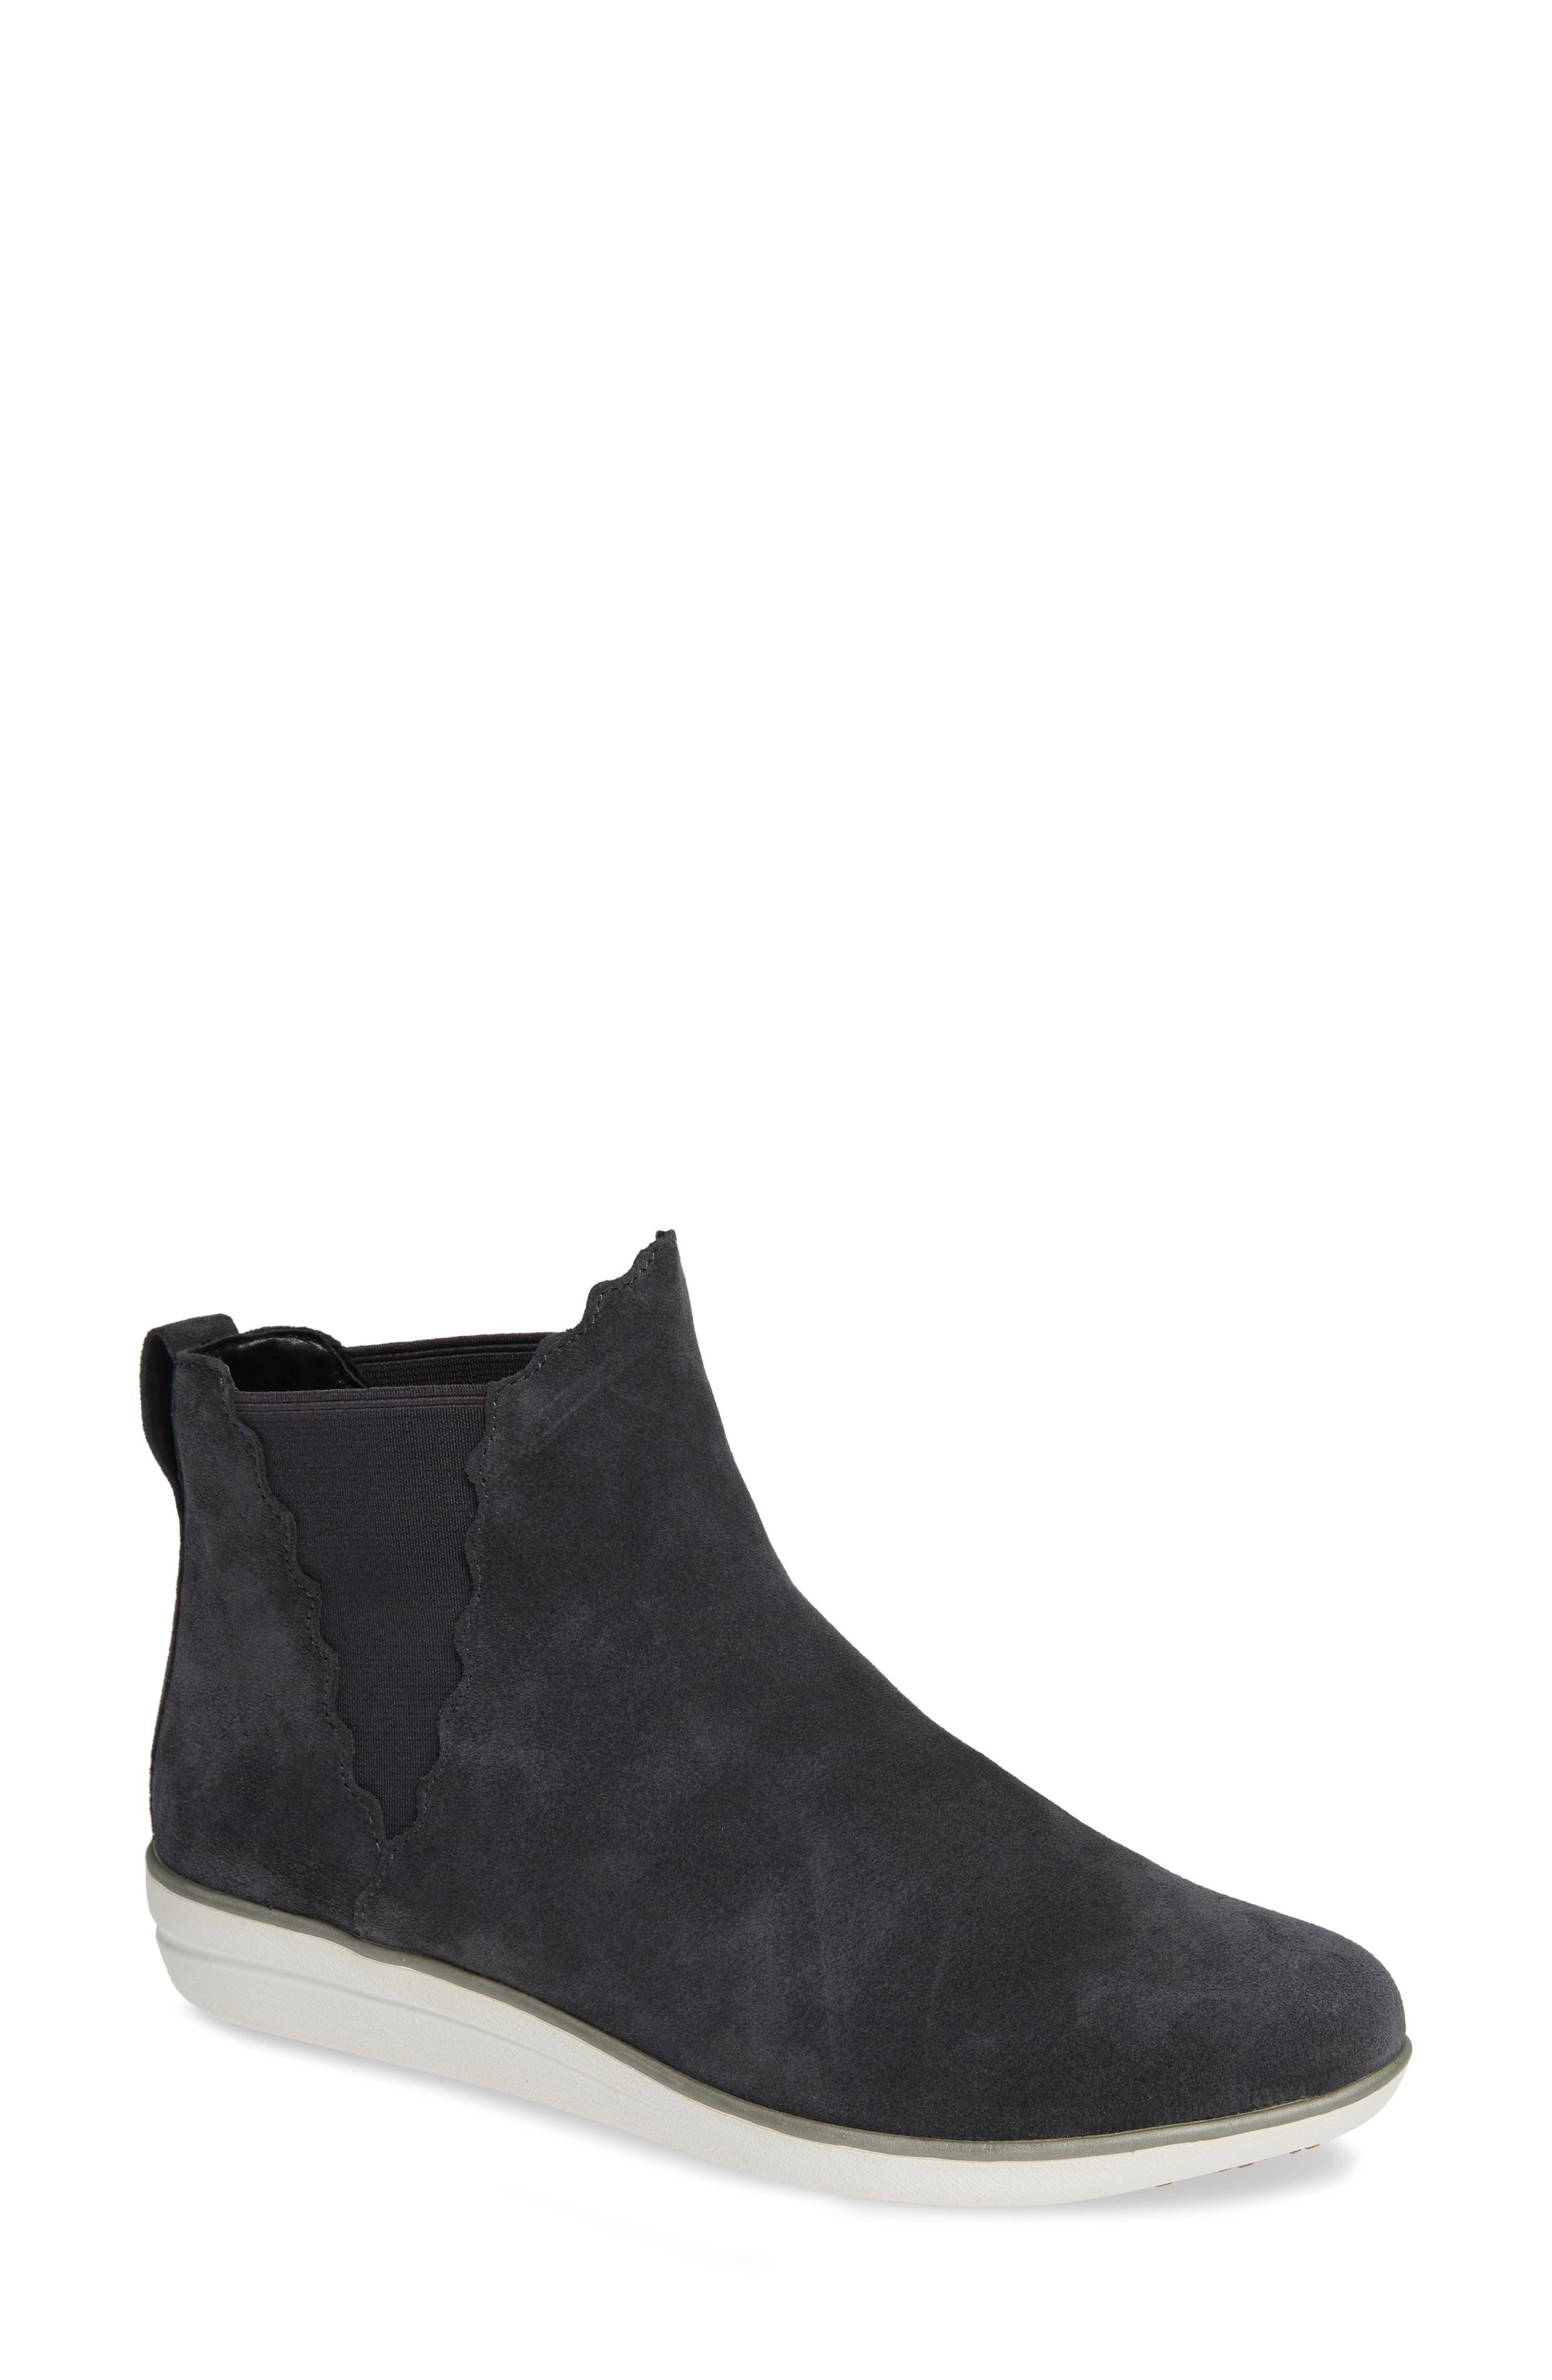 Aetrex Alanna Slip-On High Top Sneaker, Grey